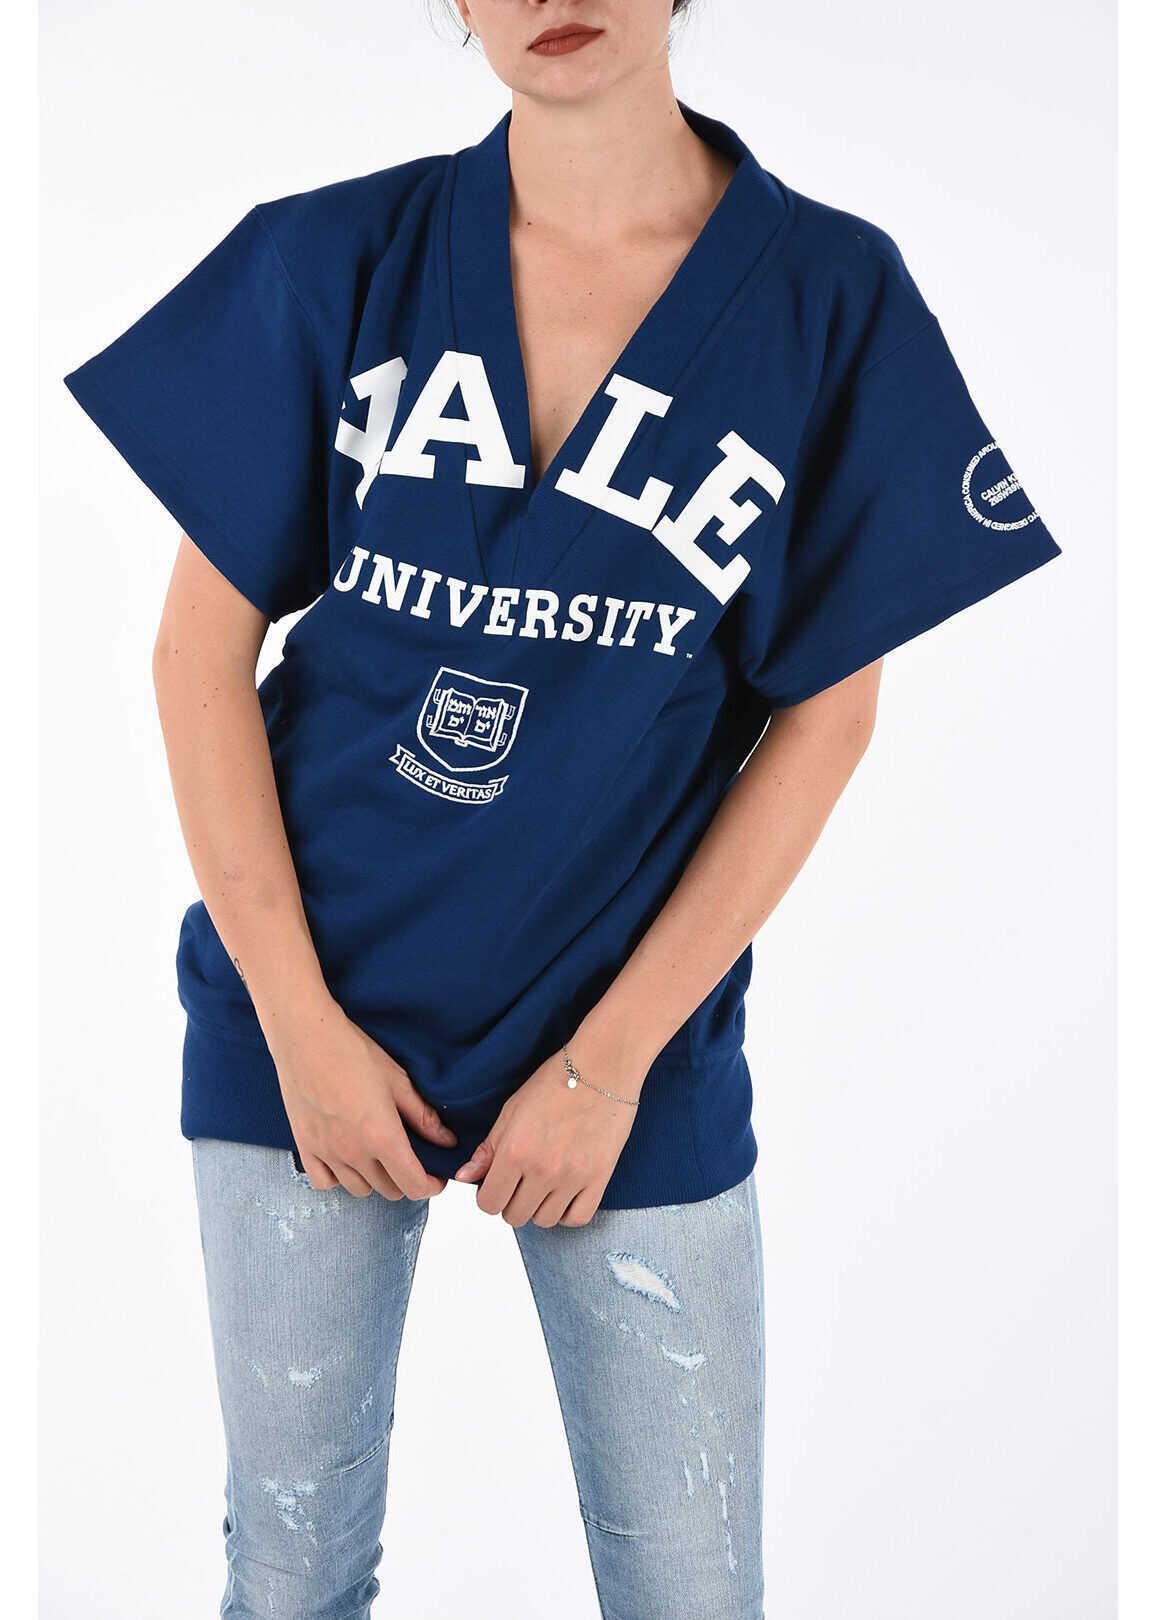 Calvin Klein 205W39NYC YALE UNIVERSITY Sweat T-shirt BLUE